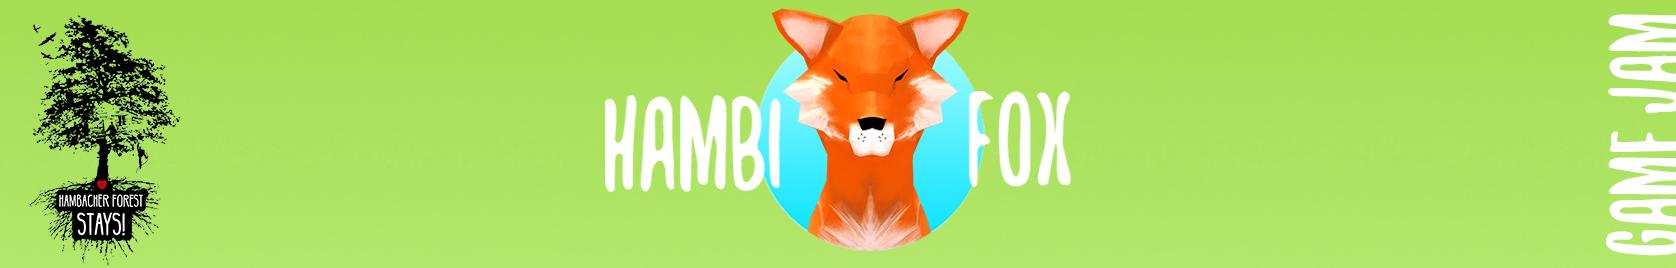 Hambi Fox